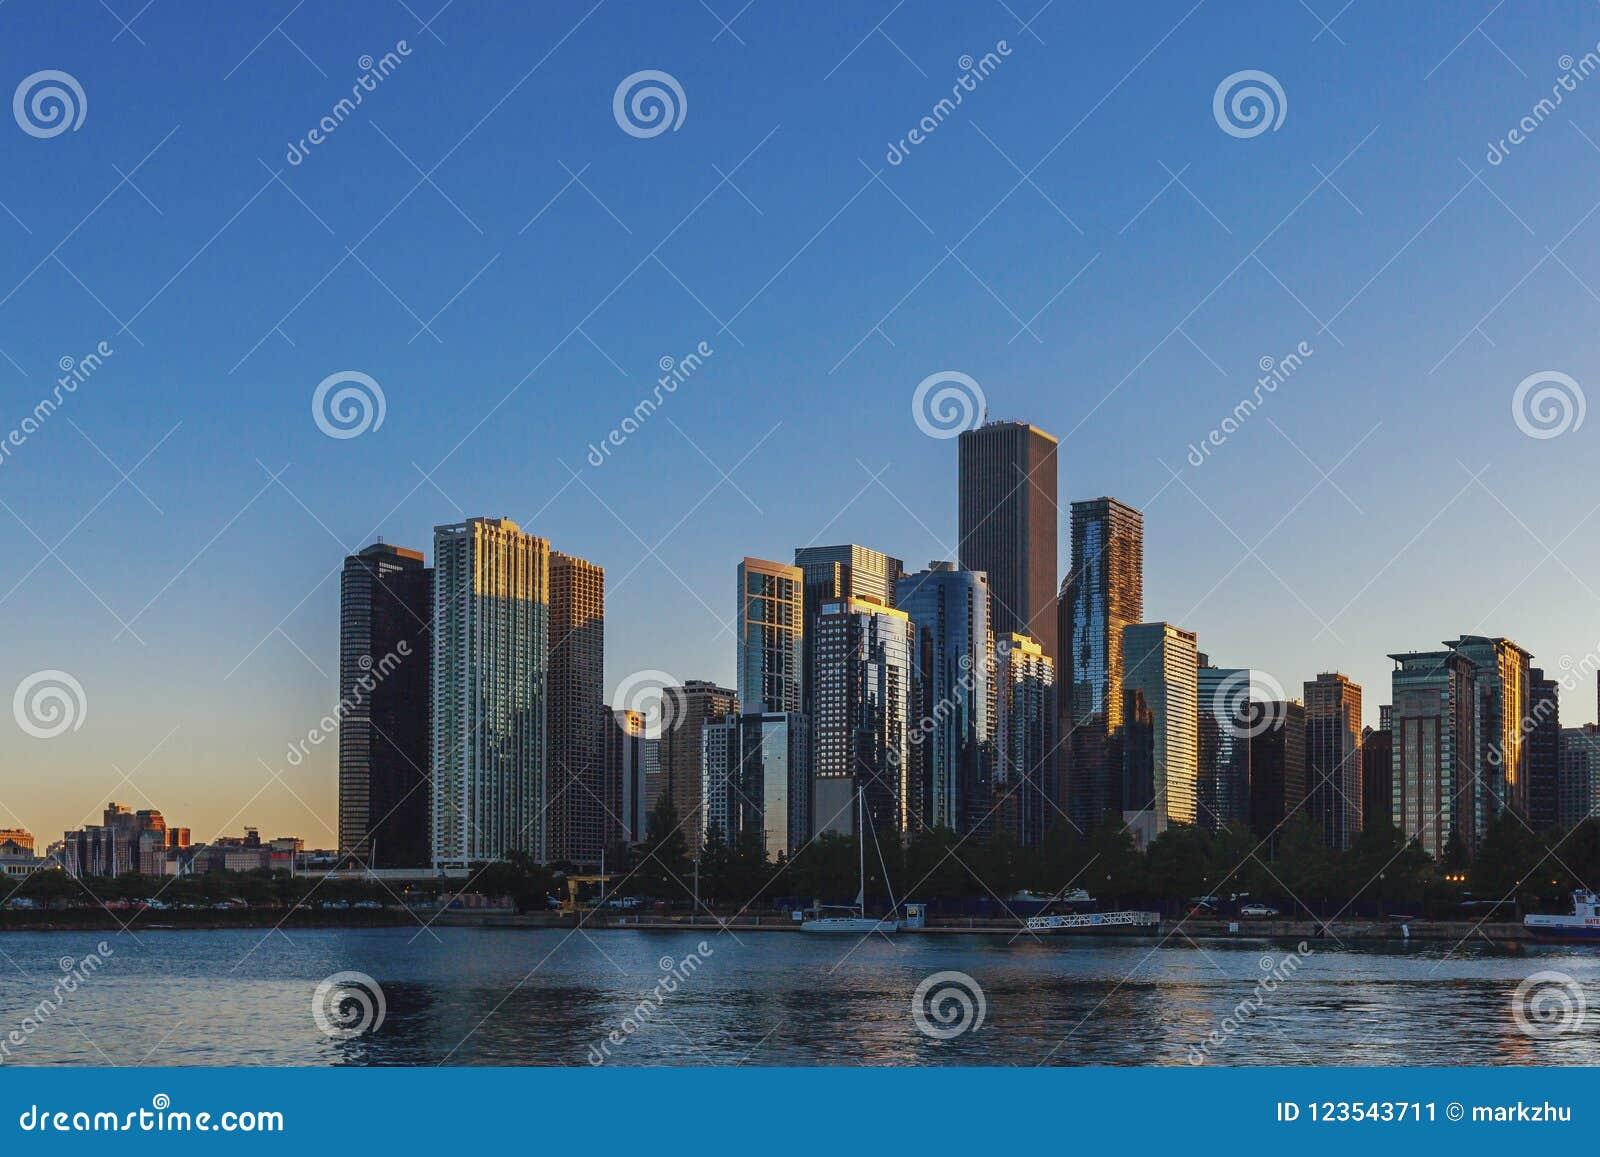 Skyline of Chicago by Lake Michigan